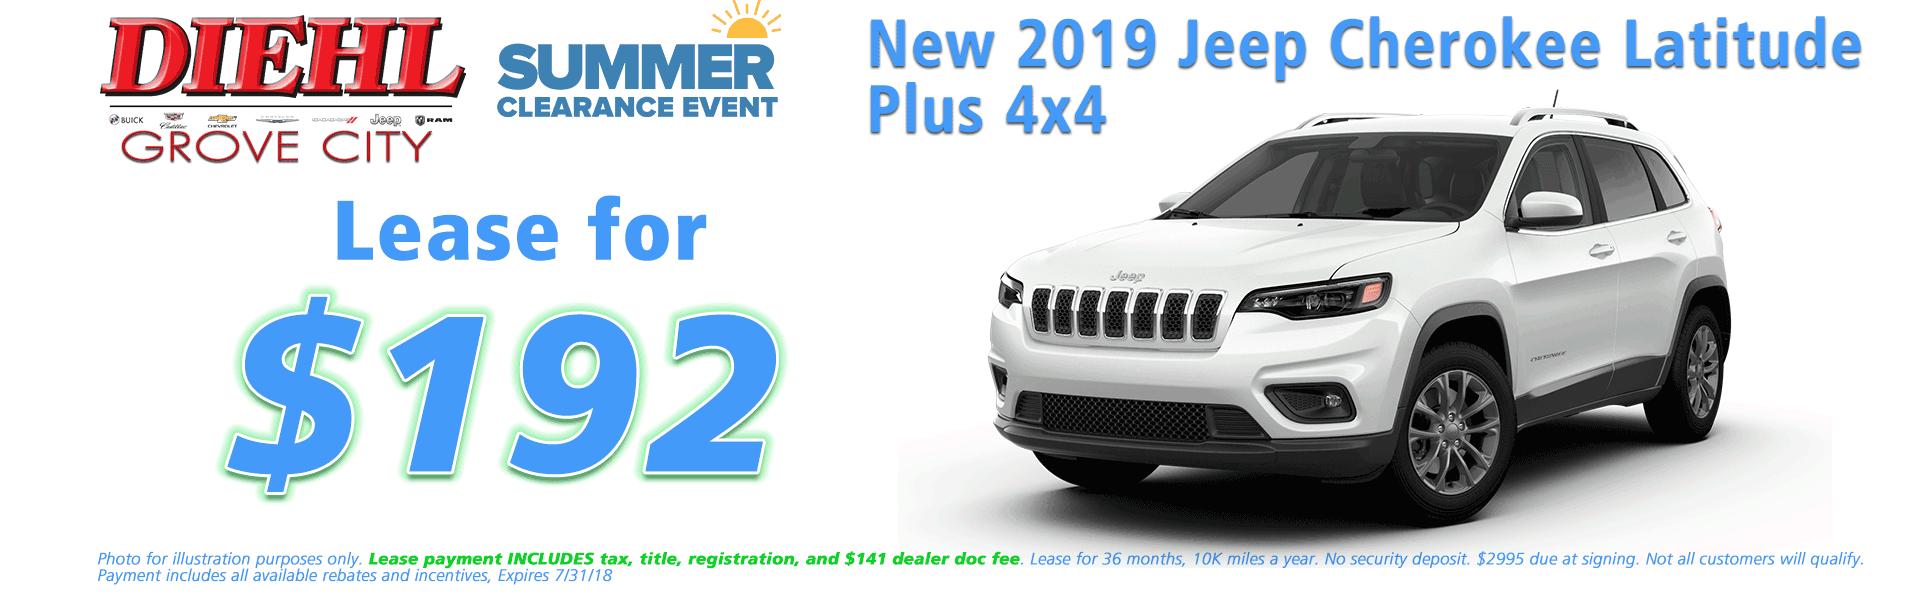 Diehl of Grove City, Grove City, PA 16127 Chrysler Jeep Dodge Ram Chevrolet Buick Cadillac NEW 2019 JEEP CHEROKEE LATITUDE PLUS 4X4